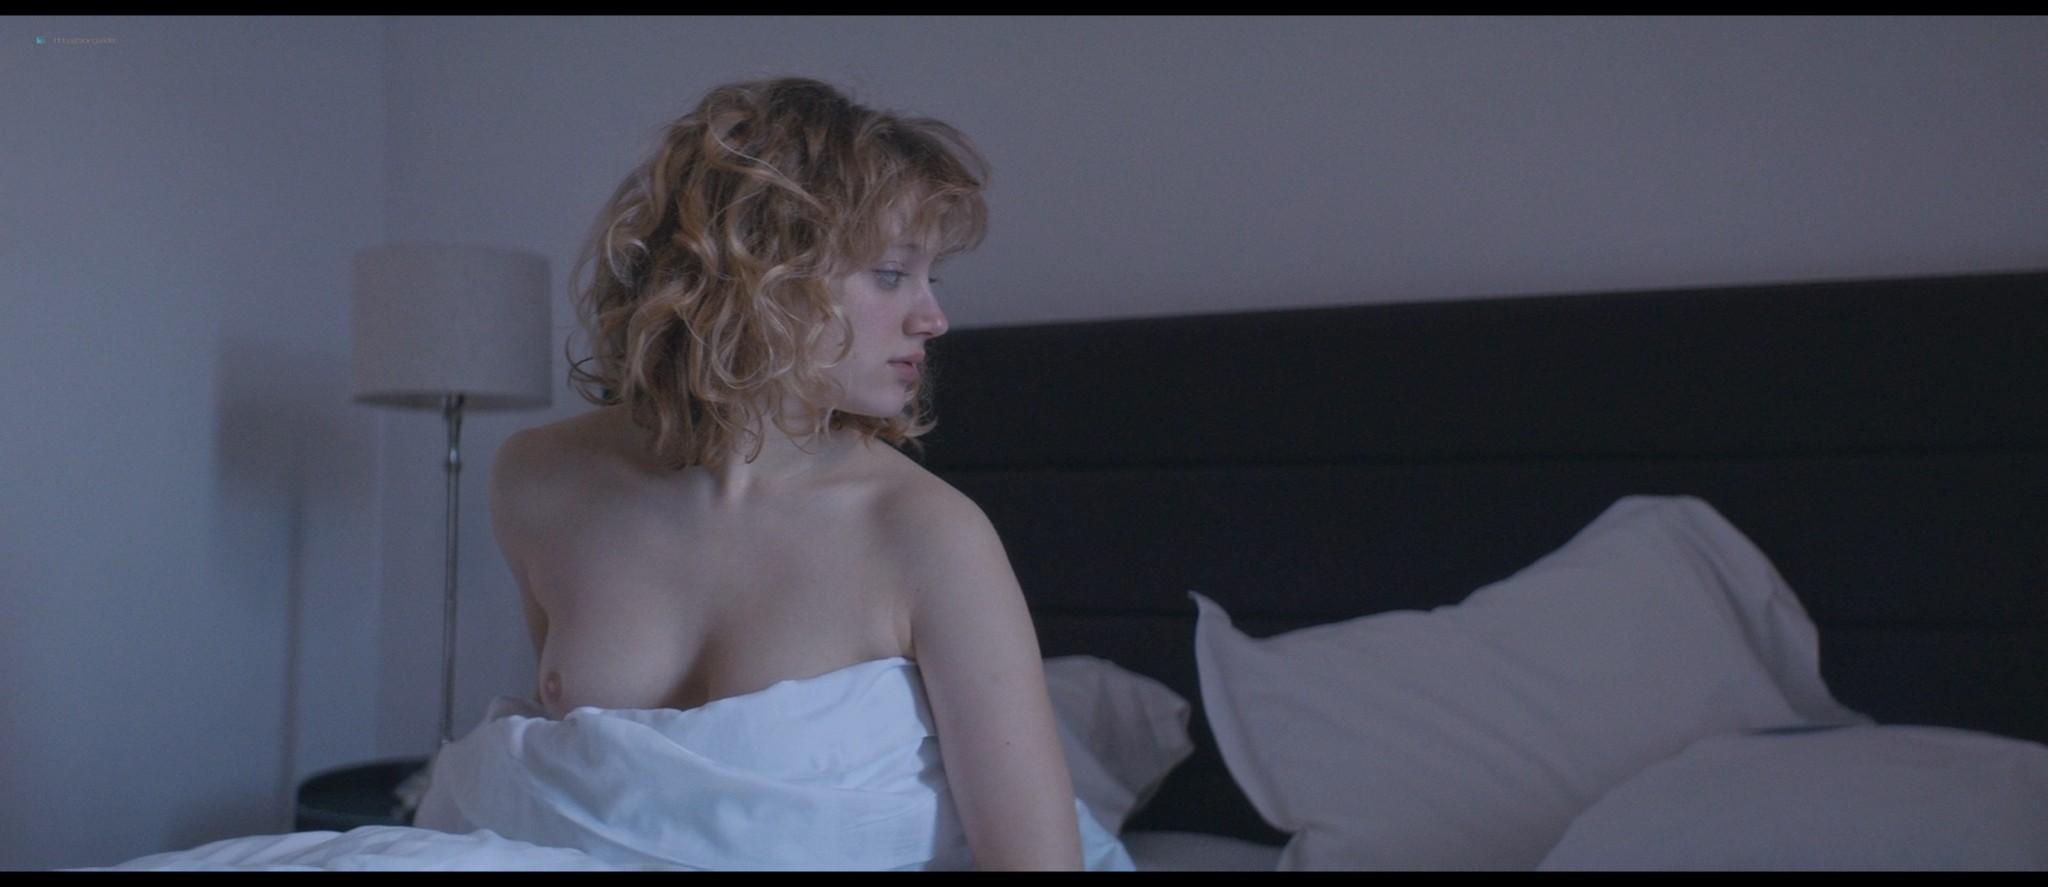 Nadia Tereszkiewicz nude lesbian sex with Valeria Bruni Tedeschi - Seules les bêtes (FR-2019) HD 1080p BluRay (4)